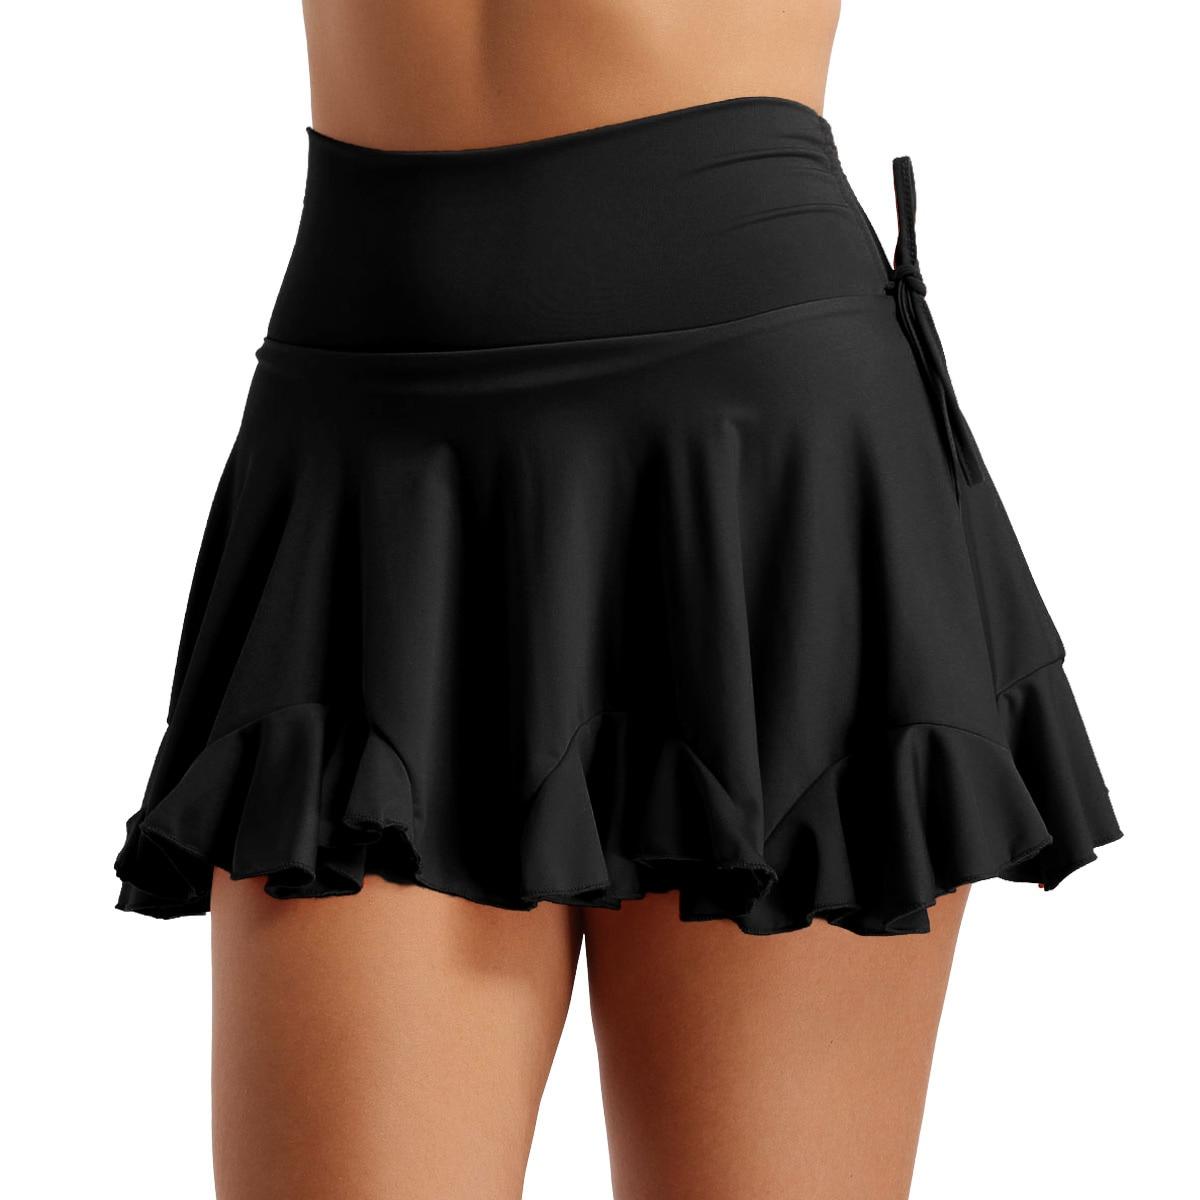 Patent Leather Black Mens Soft Soled Latin Rumba Tango Ballroom Dance Shoes Chic